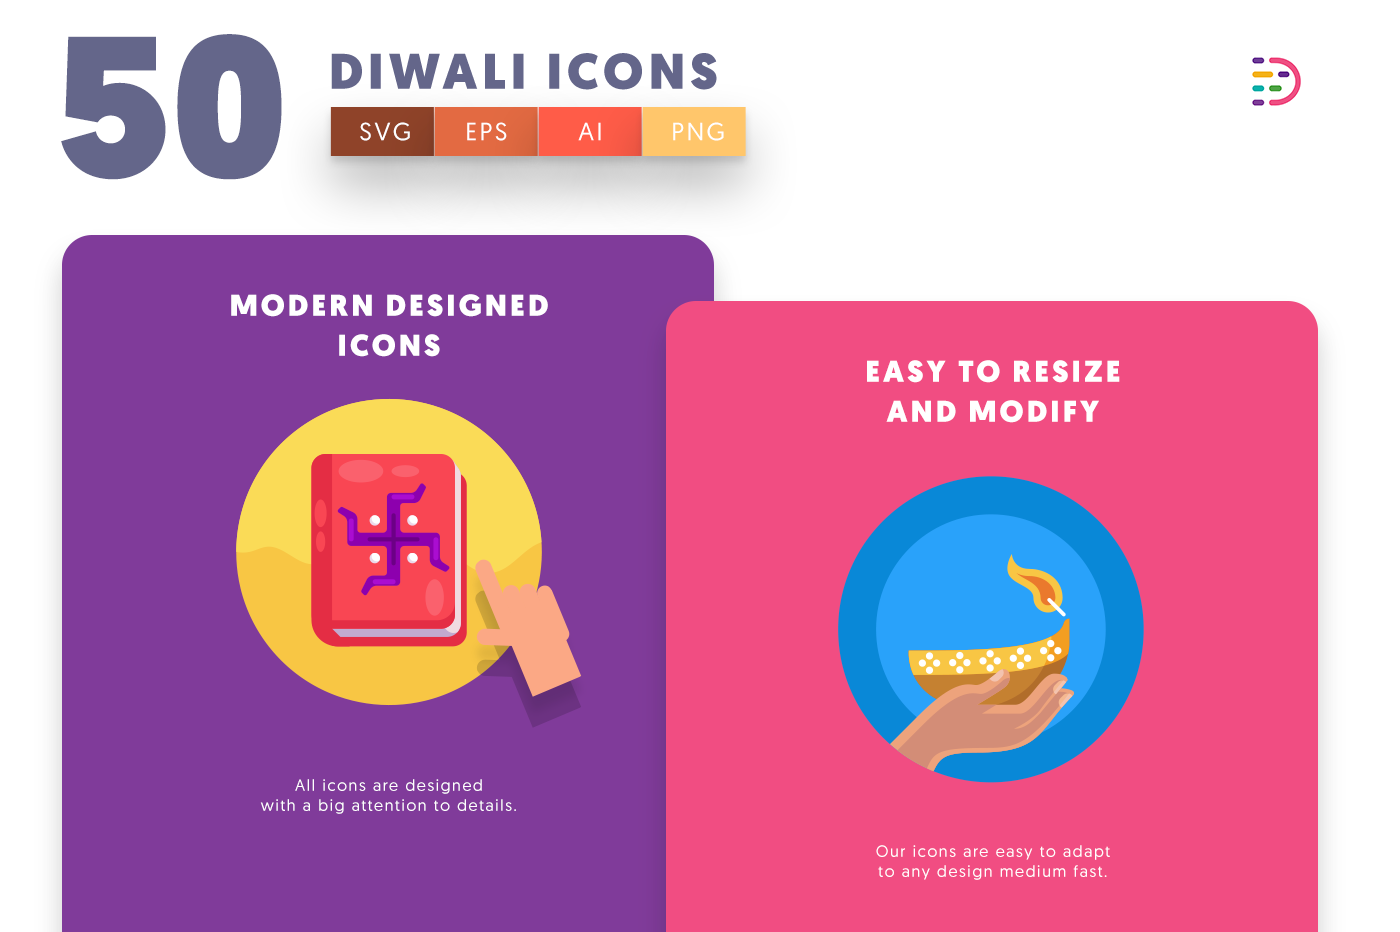 Diwali icons png/svg/eps